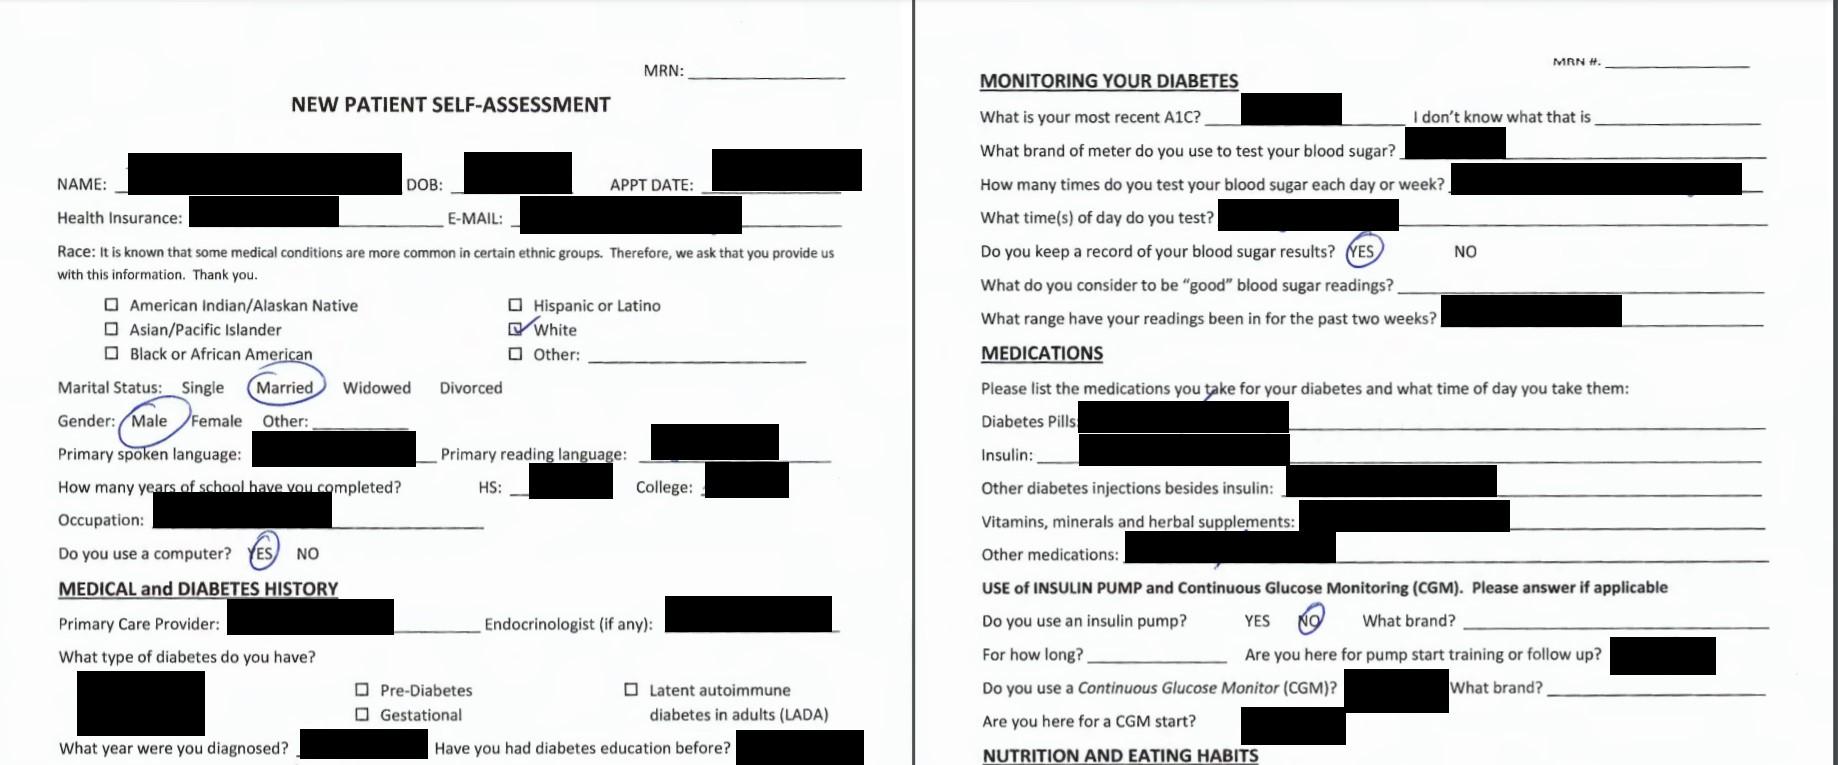 New patient self-assessment form (partial)